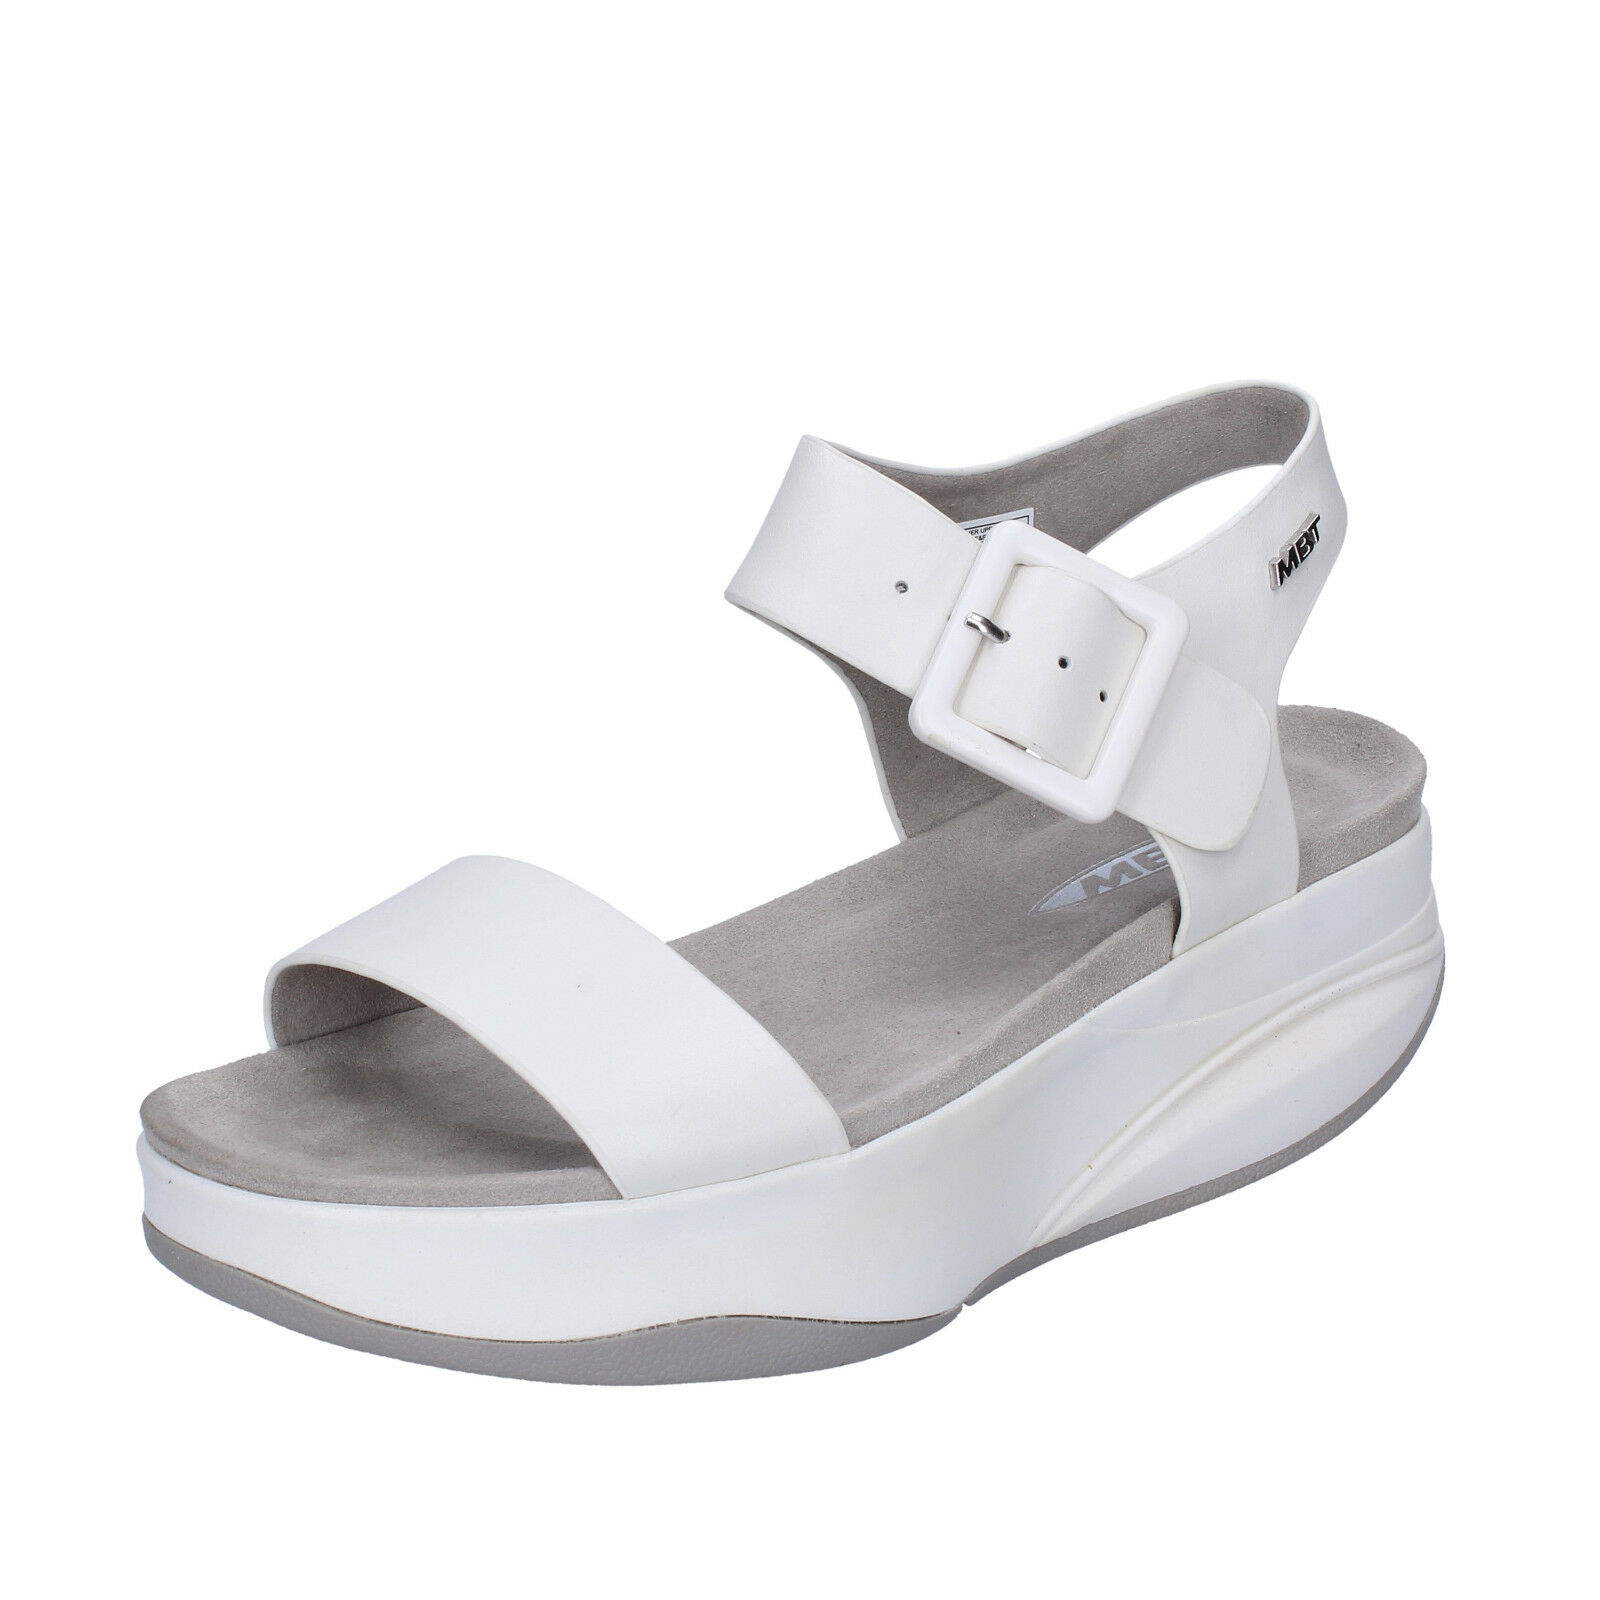 Scarpe donna MBT MANNI pelle 42 EU sandali bianco pelle MANNI performance BX884-42 2cbb94